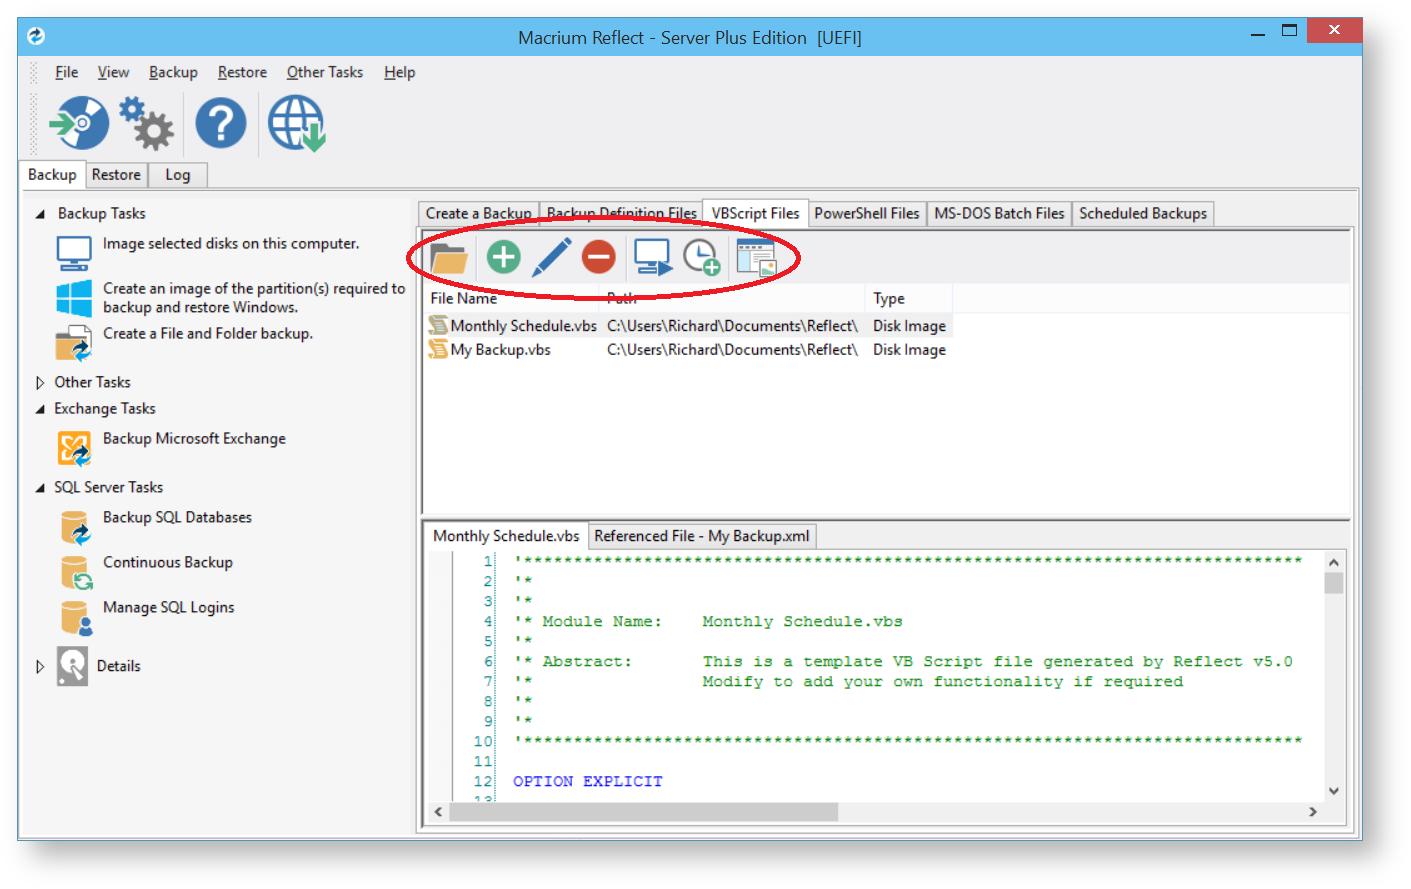 Macrium redeploy download avg 2019 free download windows 7